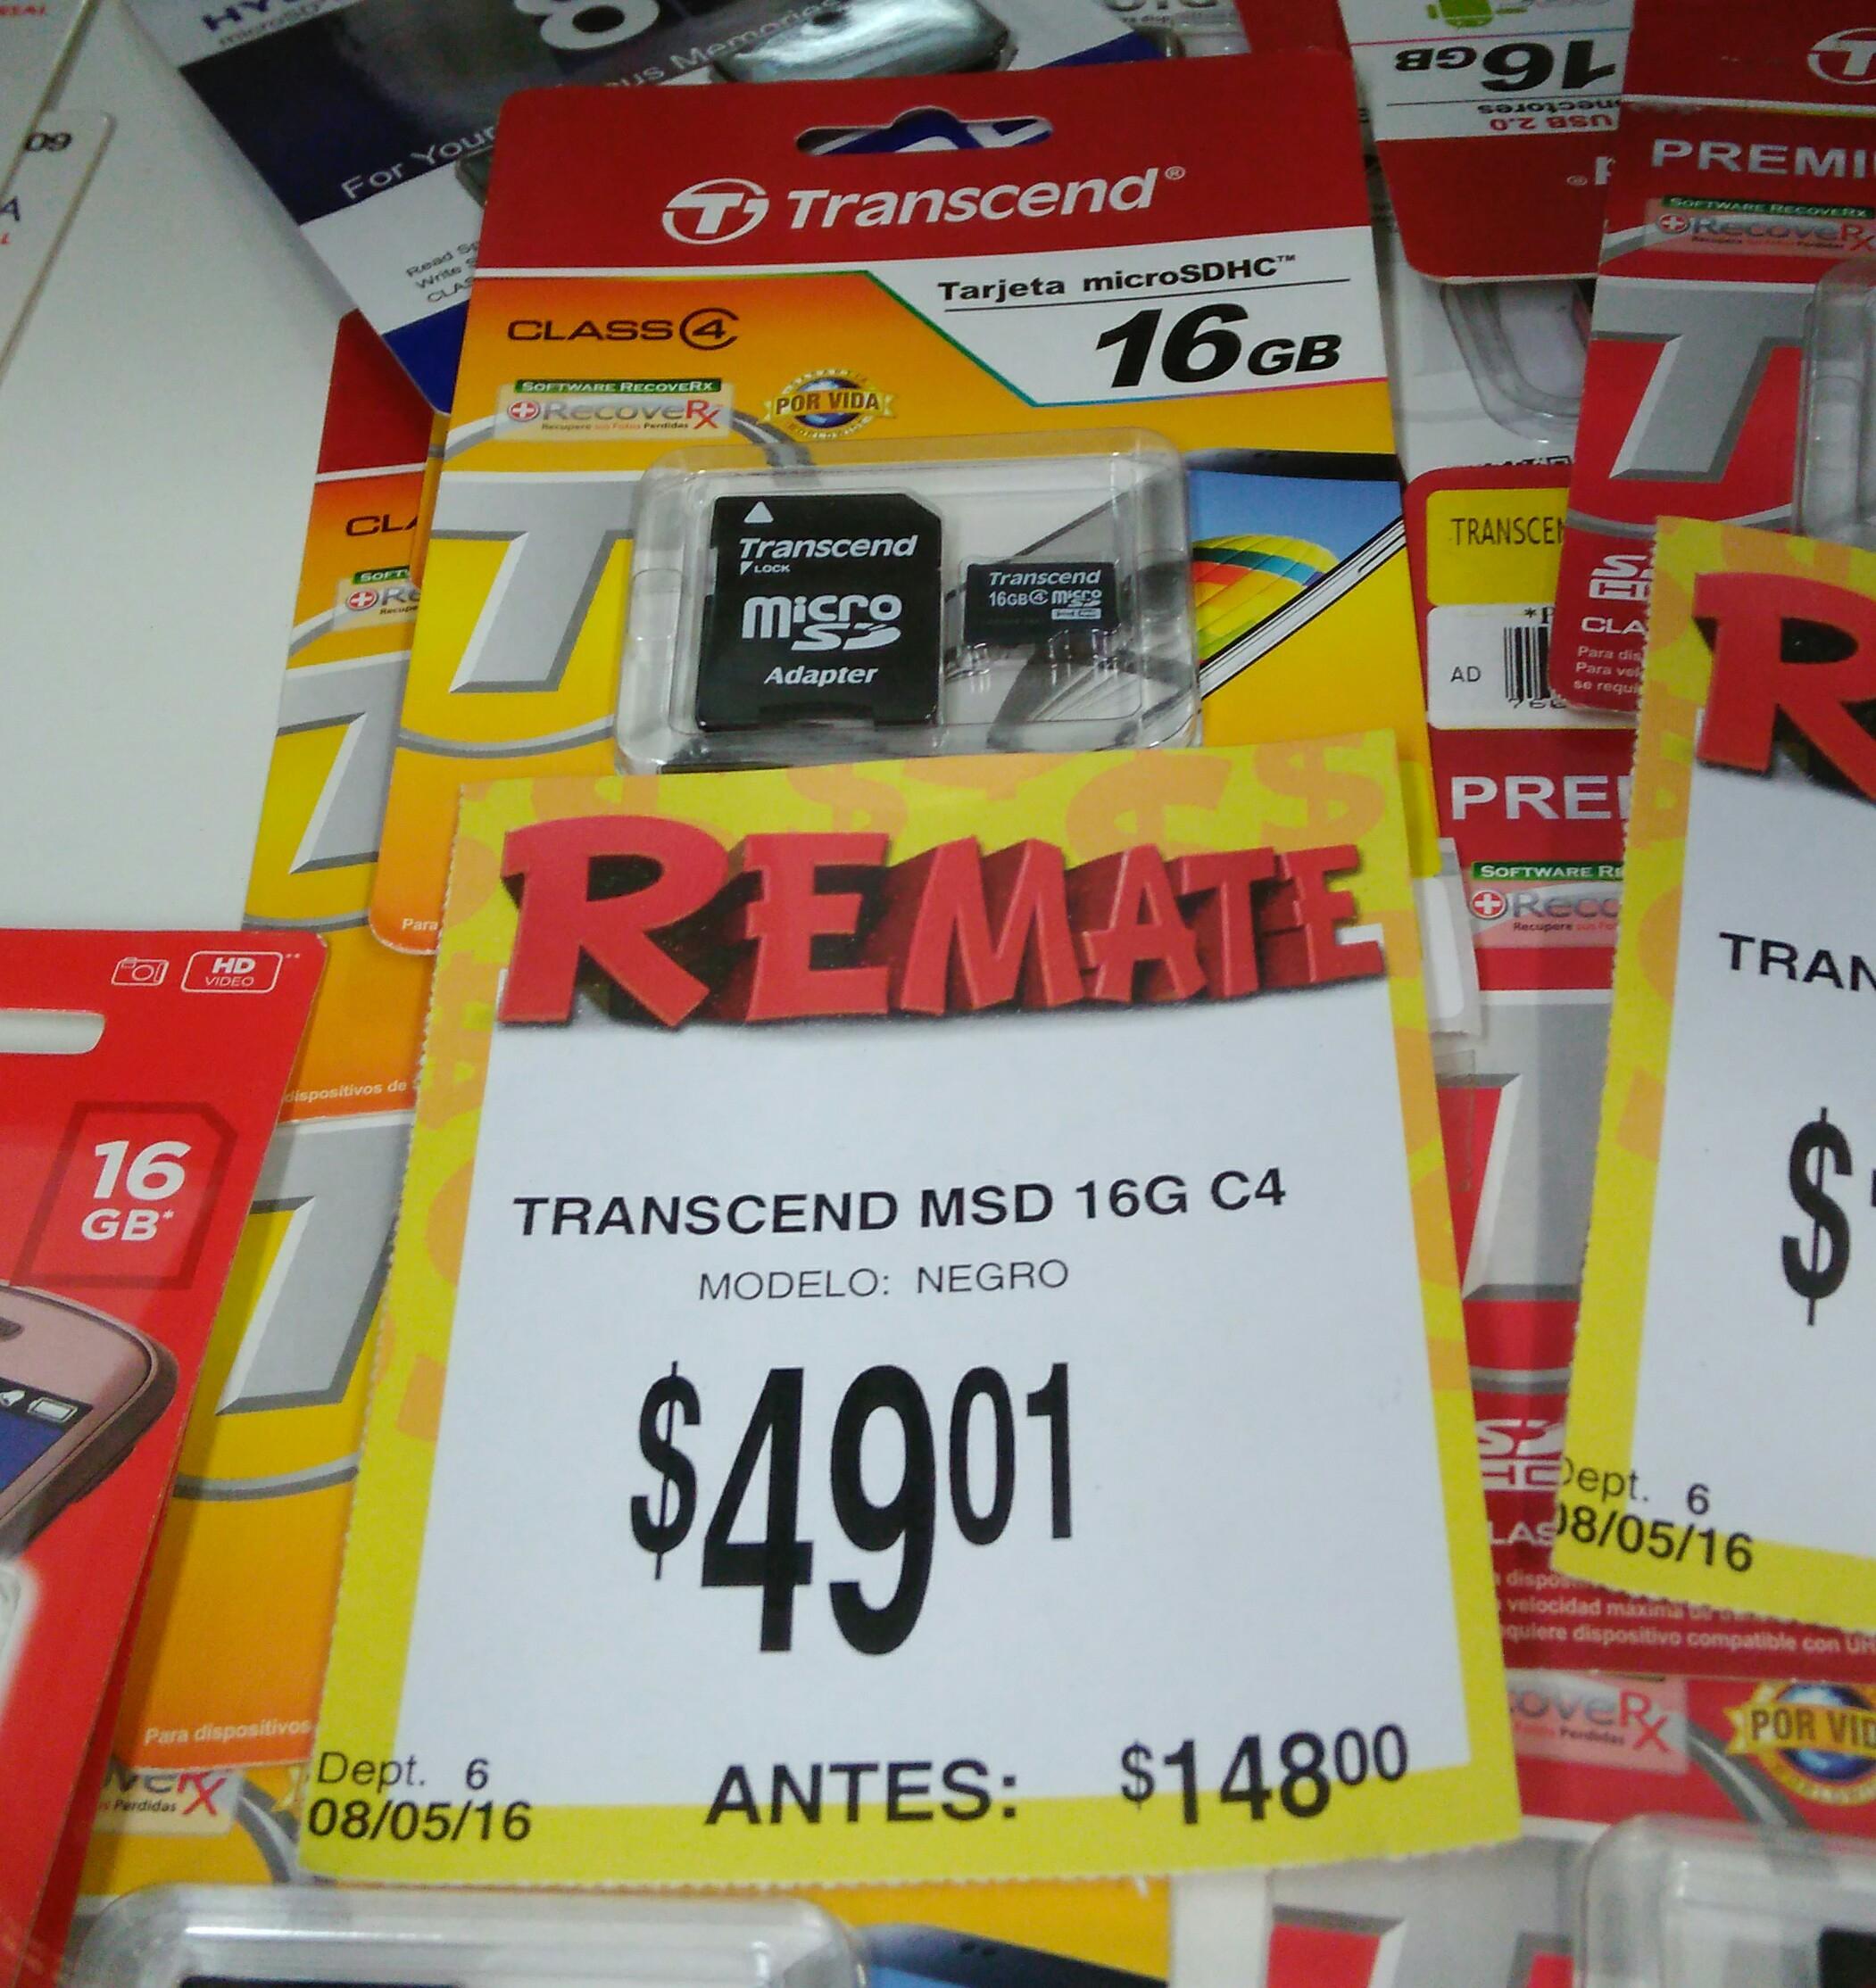 Bodega Aurrerá: Tarjeta de memoria micro SD Transcend de 16G a $49.01